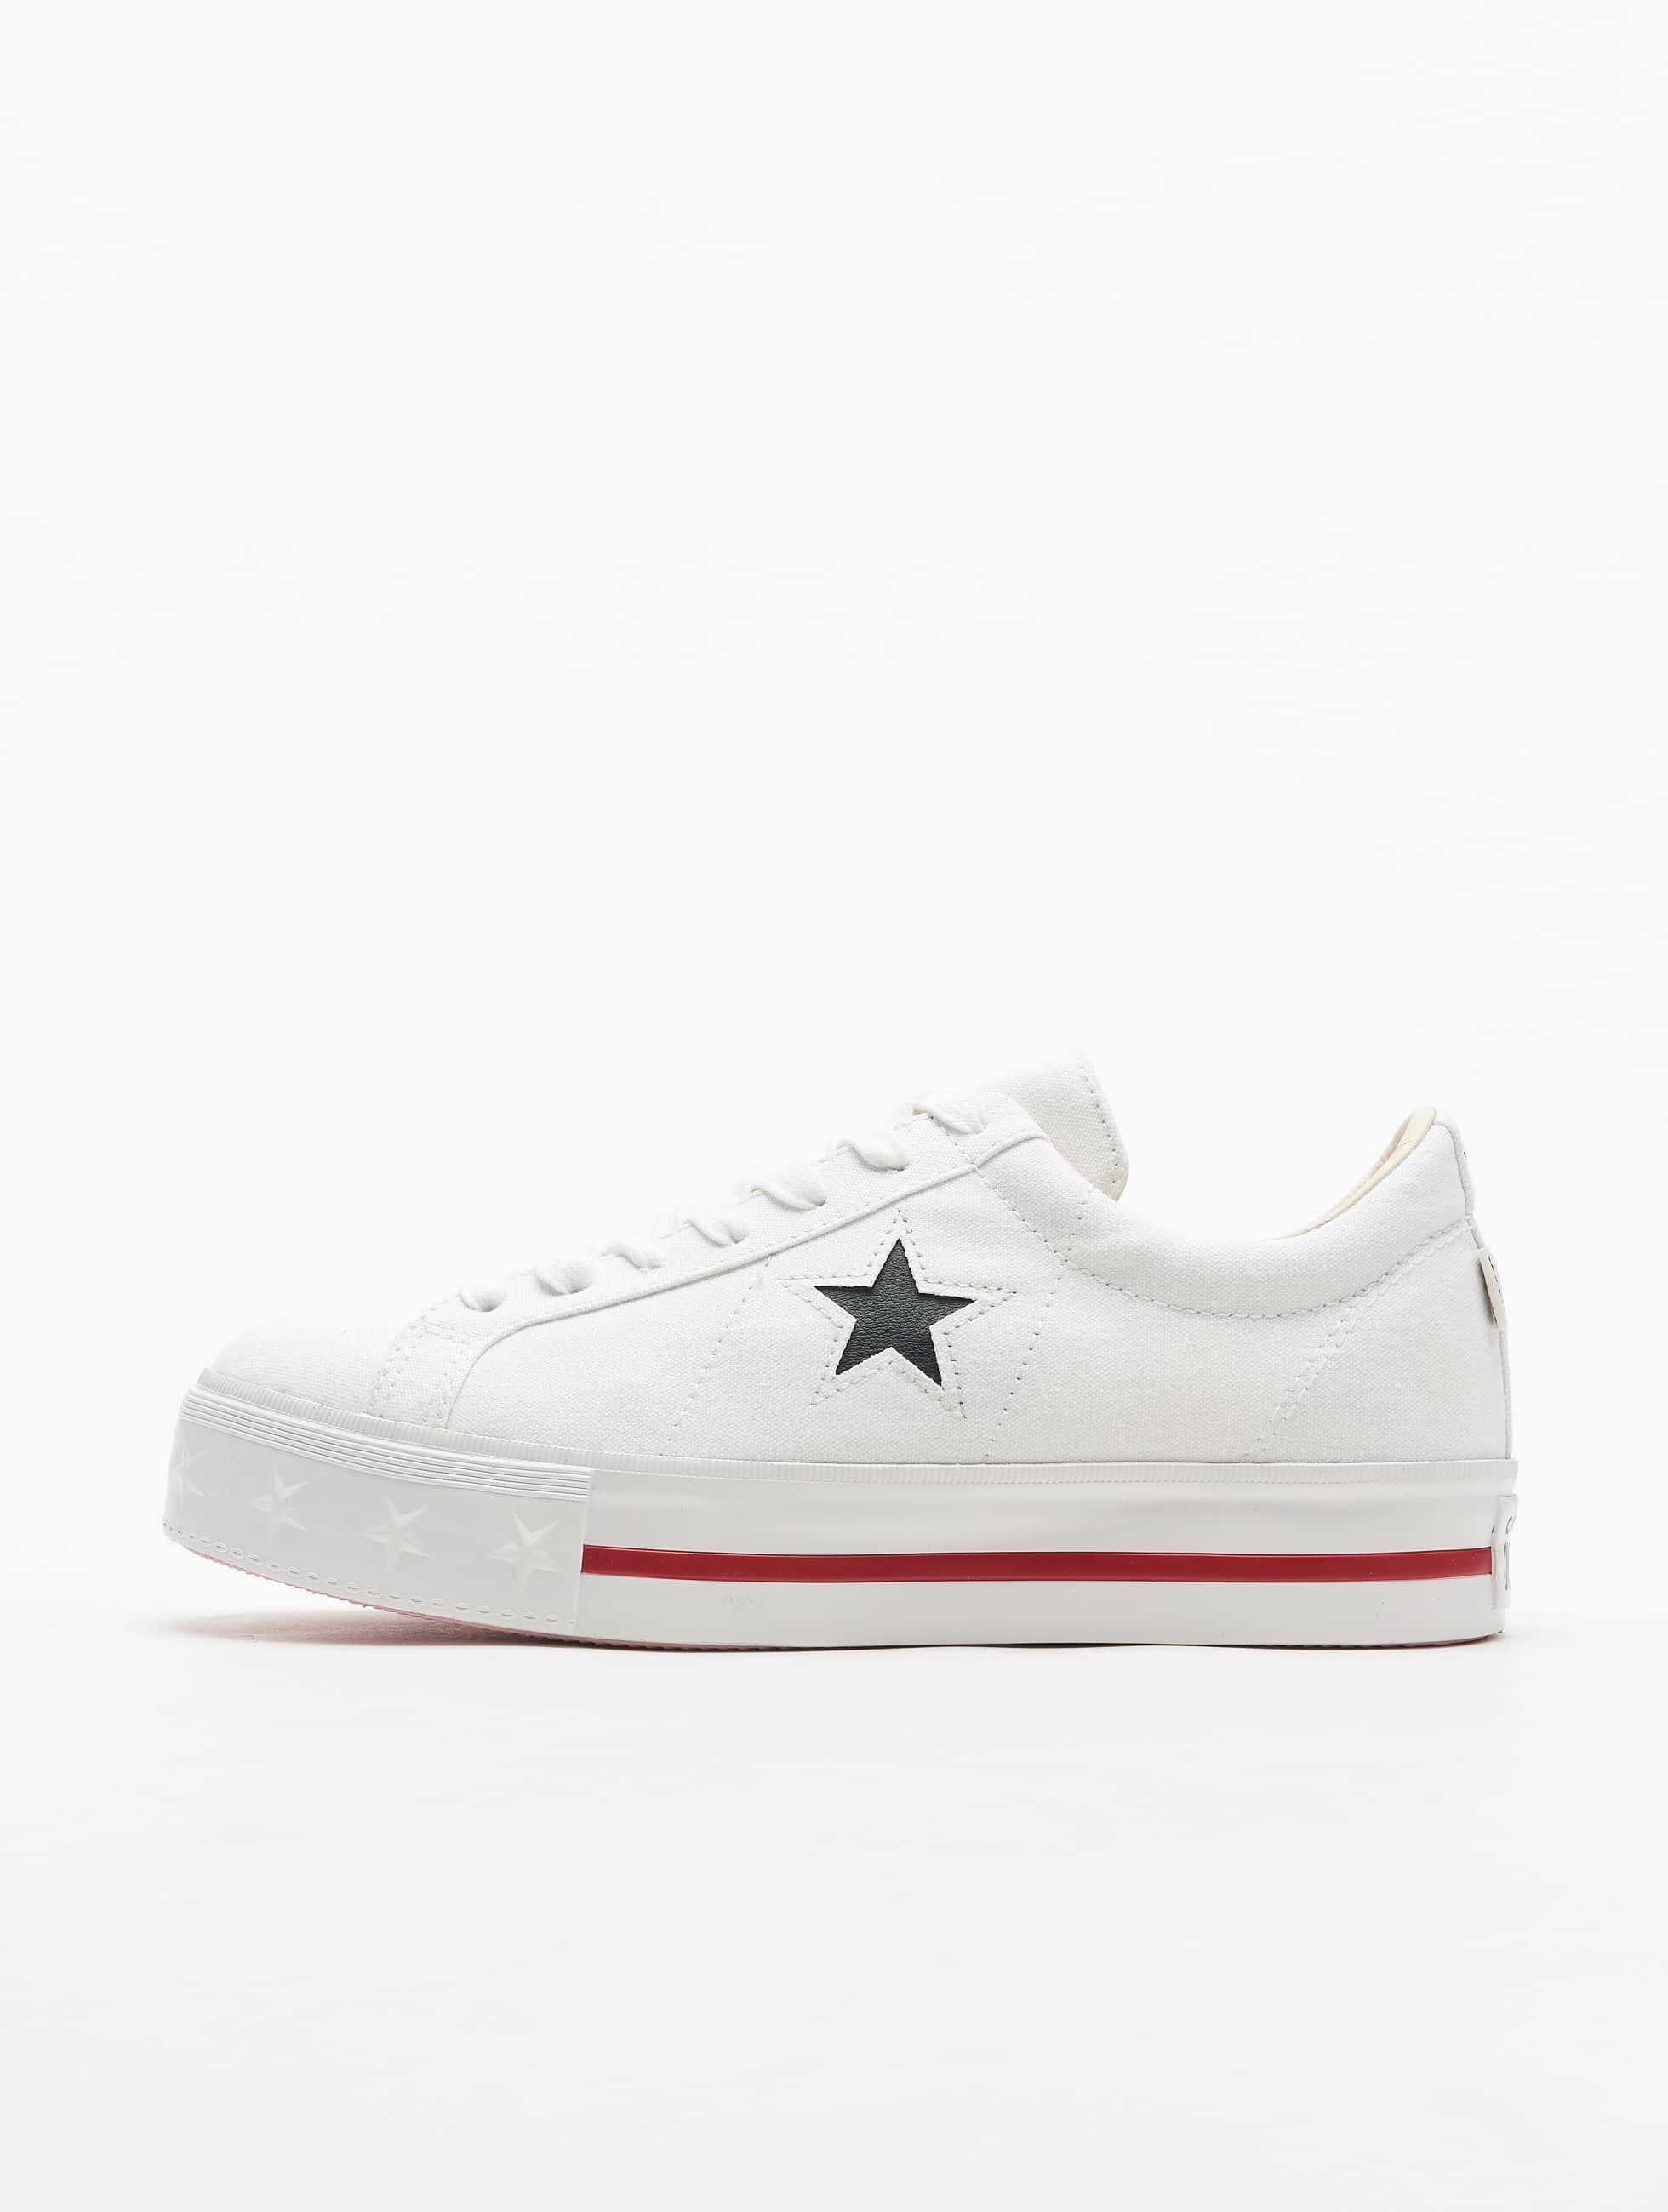 svart and vit One Star Platform Ox dam's Sneakers